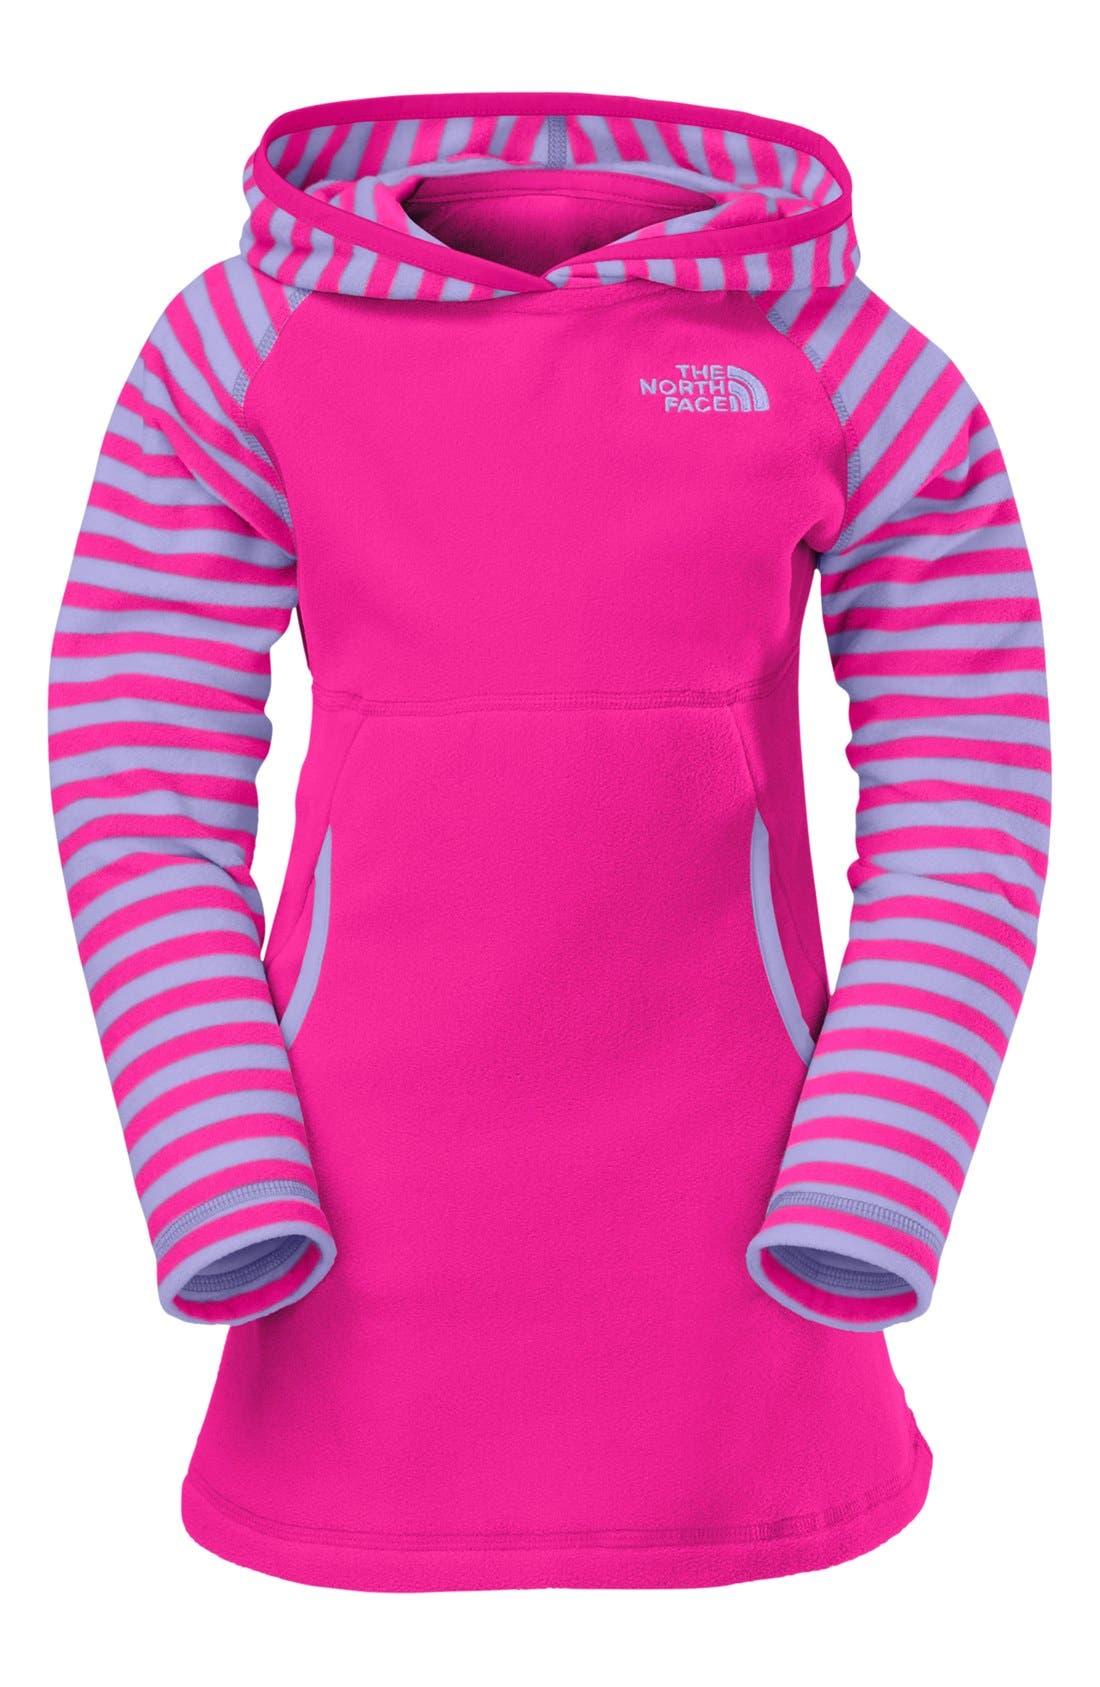 Alternate Image 1 Selected - The North Face 'Glacier' Dress (Toddler Girls)